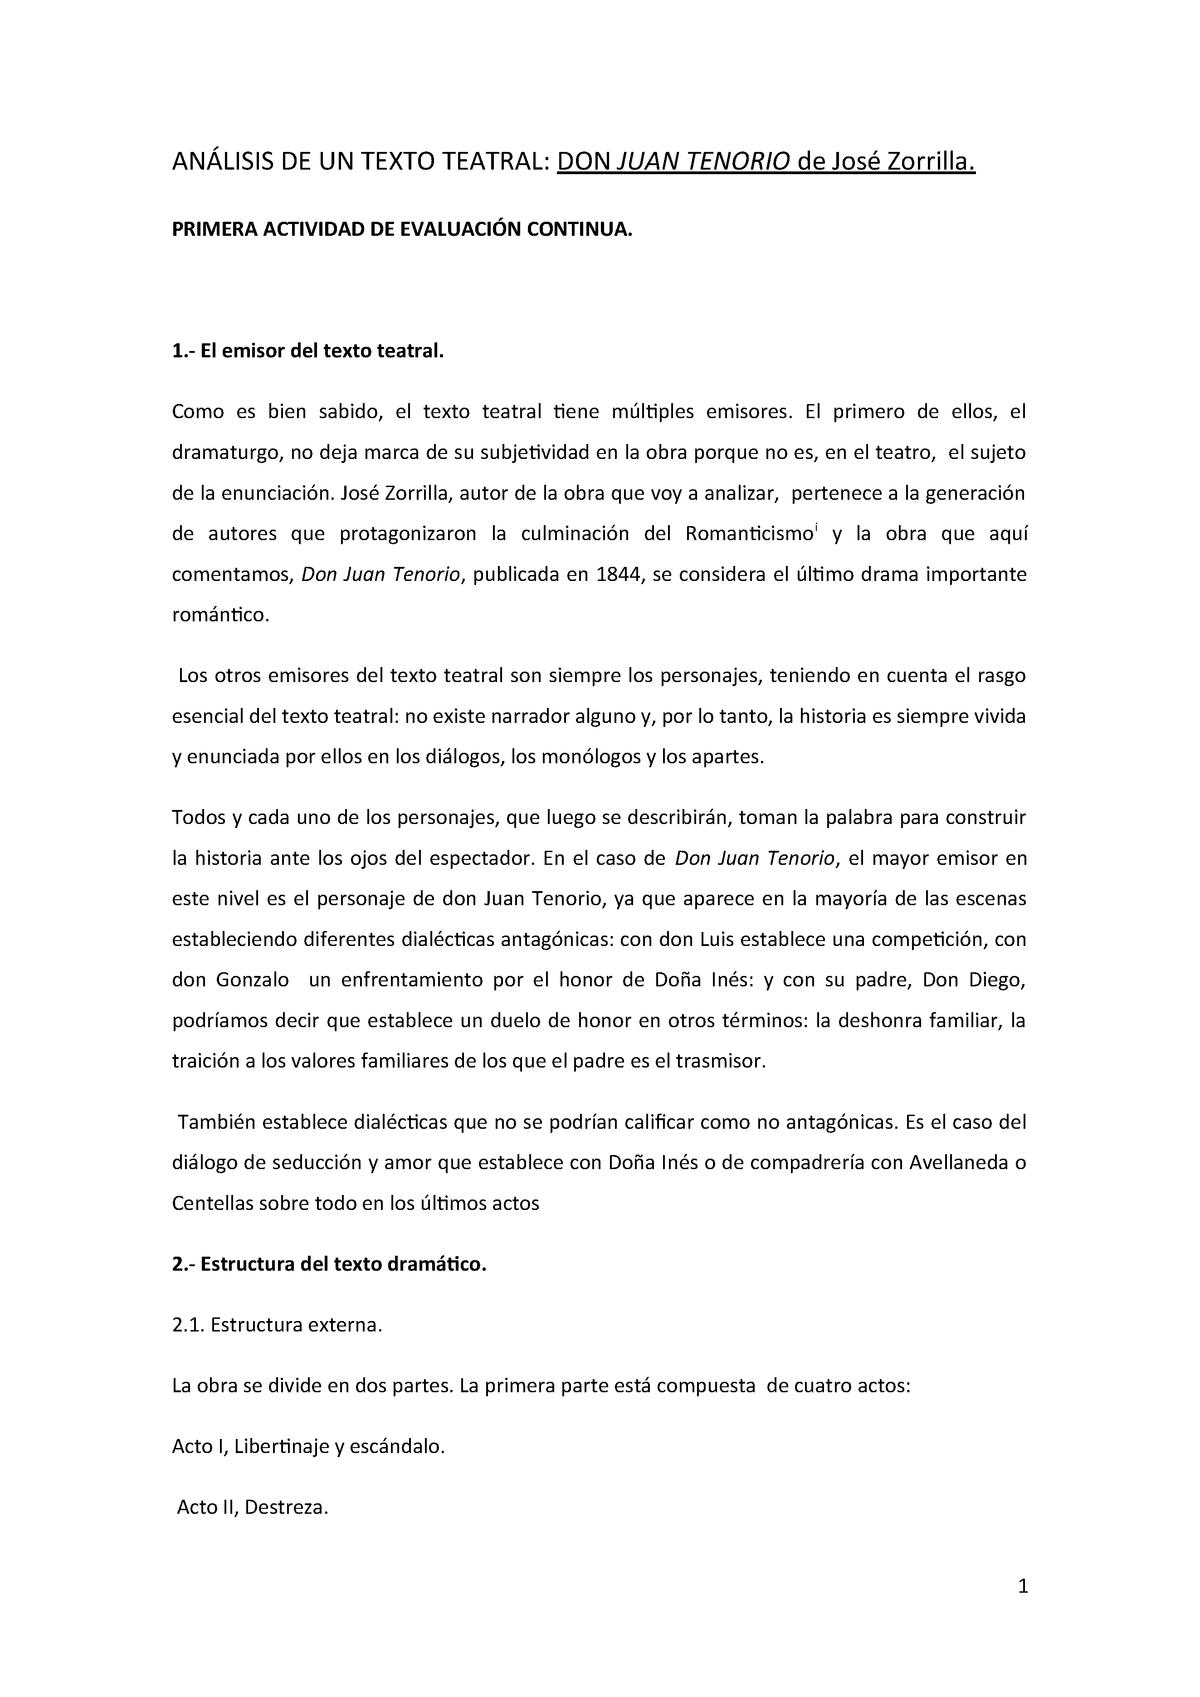 Pec An álisis De Un Texto Teatral 64014028 Uned Studocu